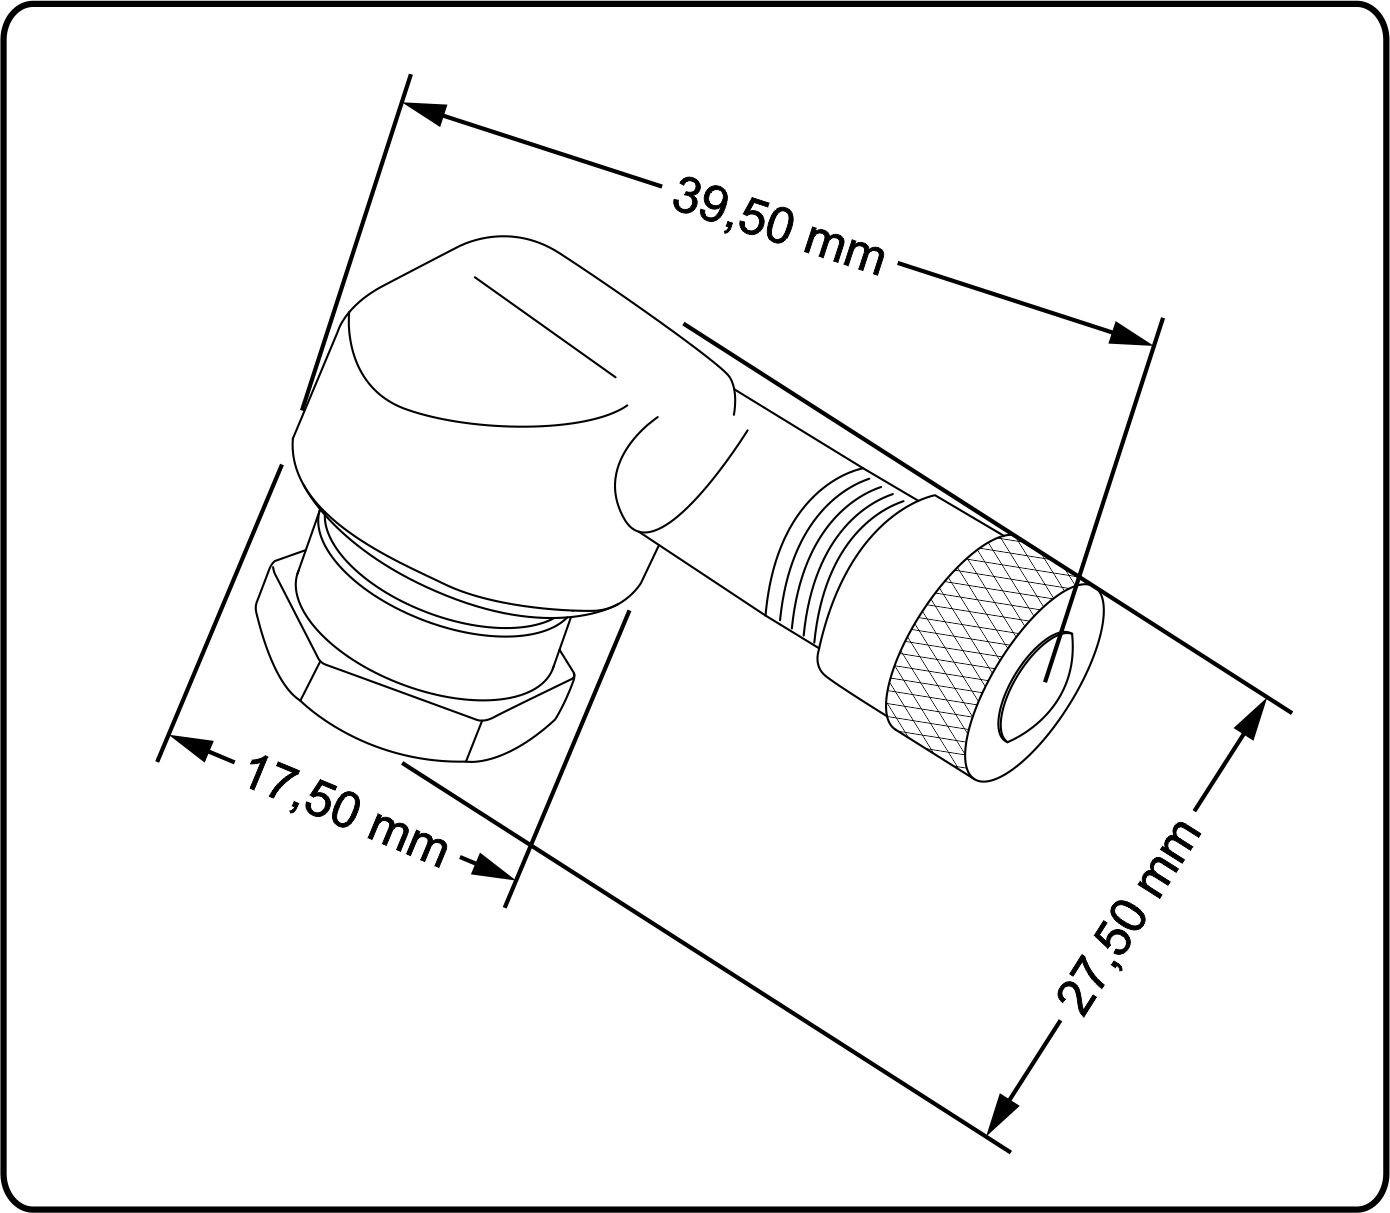 Seoproduct Bike Title Motoplastic Puig Hypermotard 796 Engine Diagram Valve Technical Features Measurements Weight